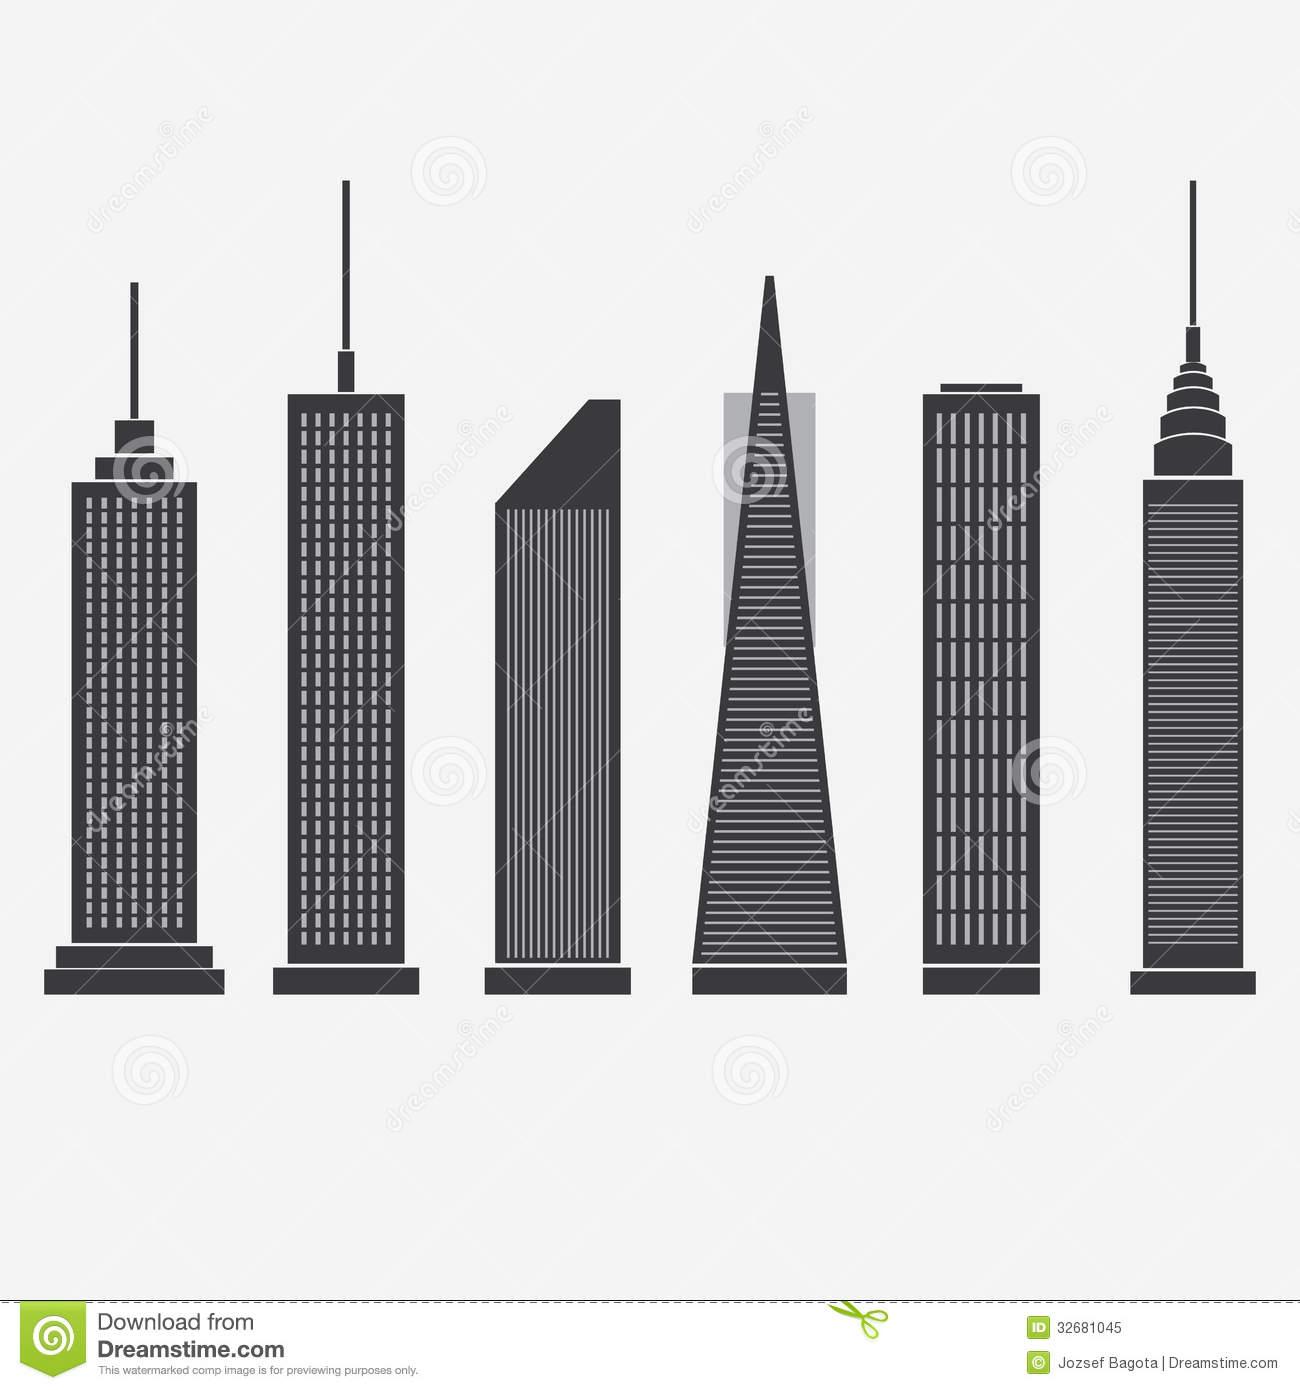 Skyscraper Icons Royalty Free Stock Photo.